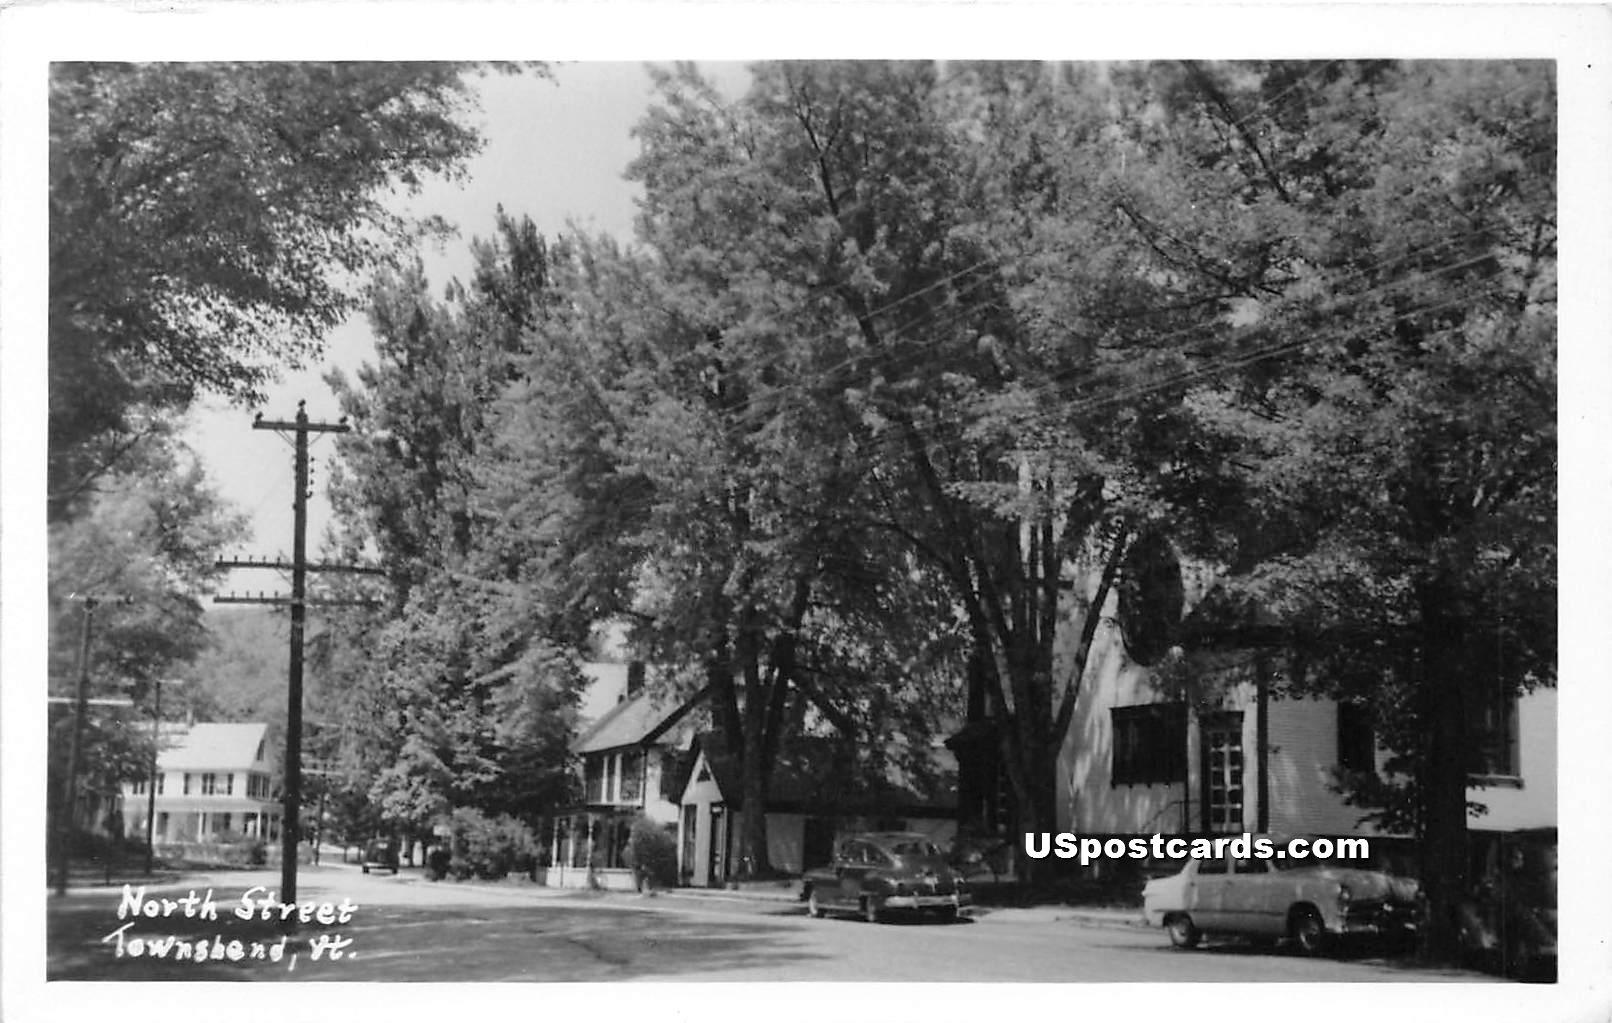 North Street - Townshend, Vermont VT Postcard